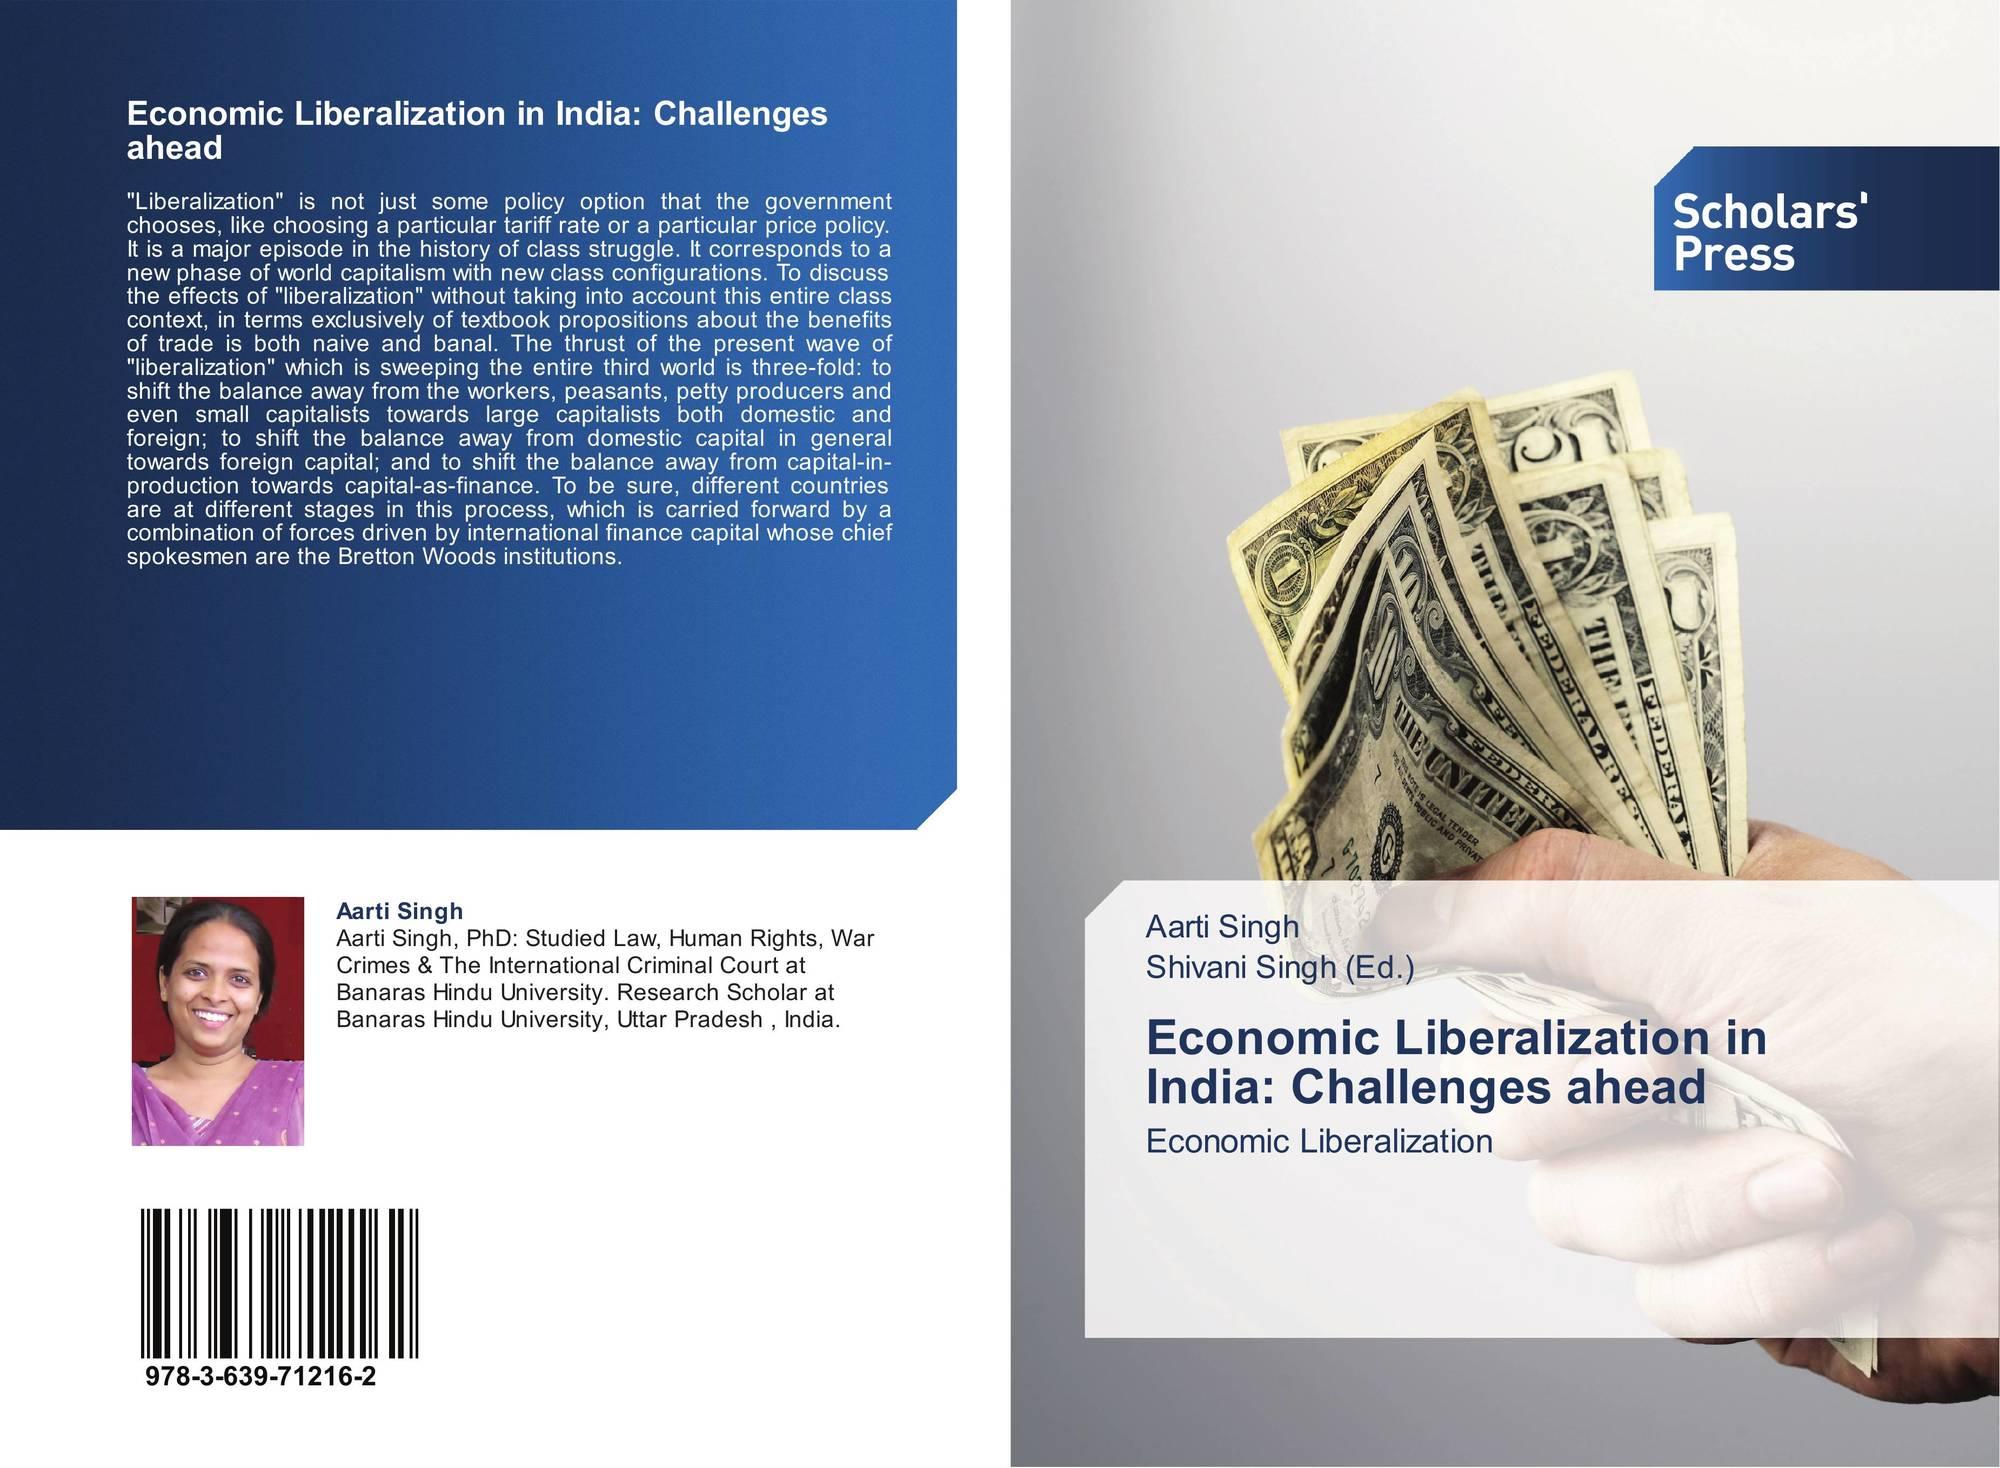 essay on economic liberalization in india